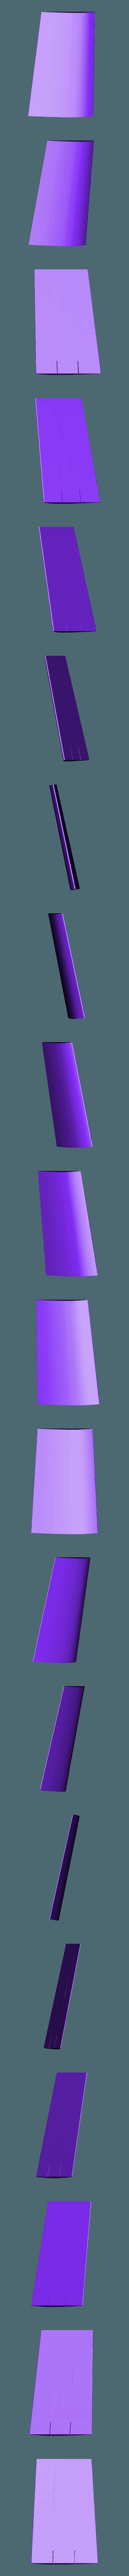 Thinner_Wing_Left_Inner.stl Download free STL file Flyer Mk. 1 • 3D printing object, billbo1958